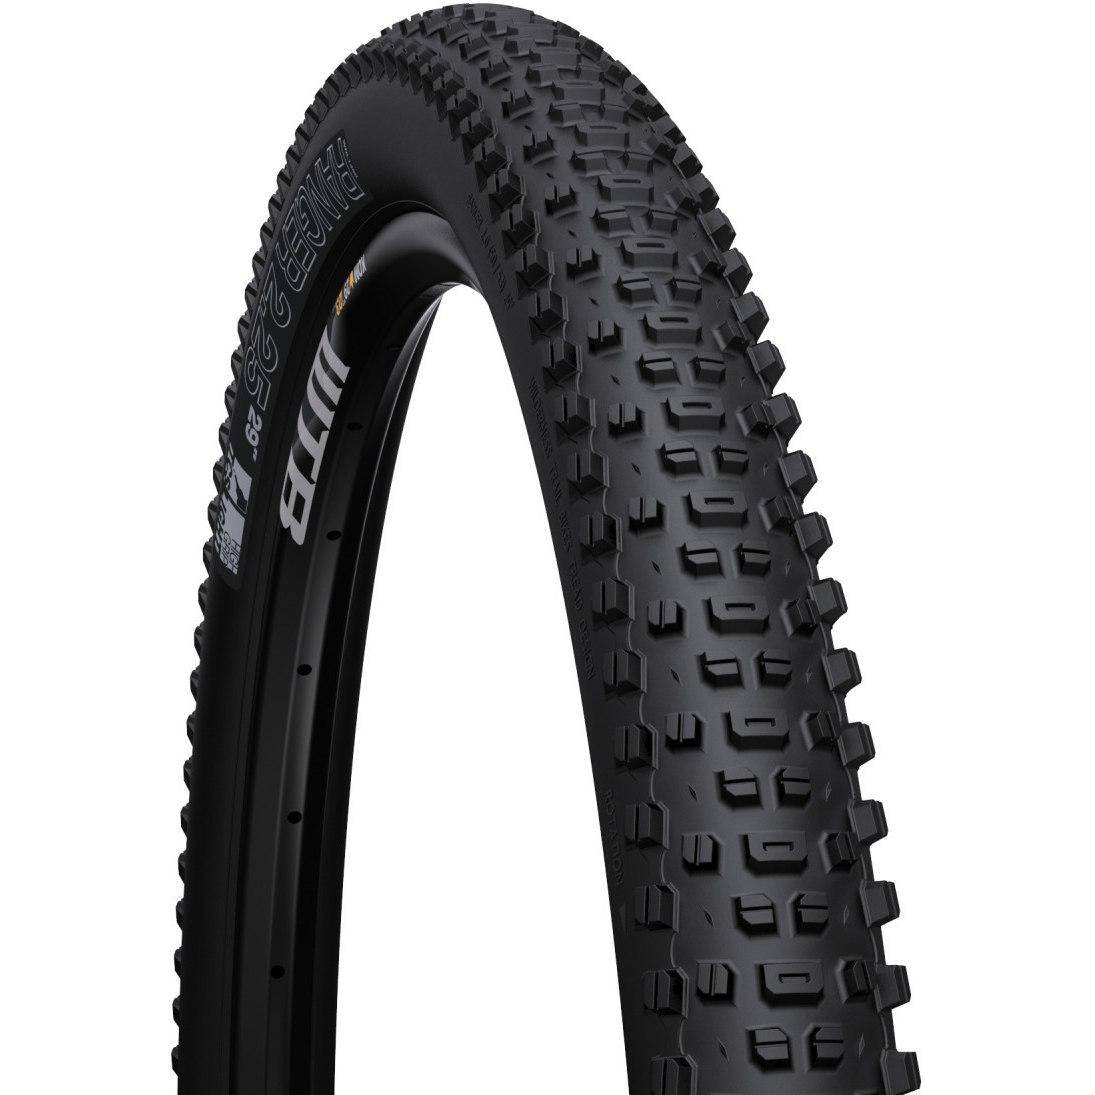 Picture of WTB Ranger TCS Tough TriTec Fast Rolling MTB Folding Tire - 29x2.4 Inches - black